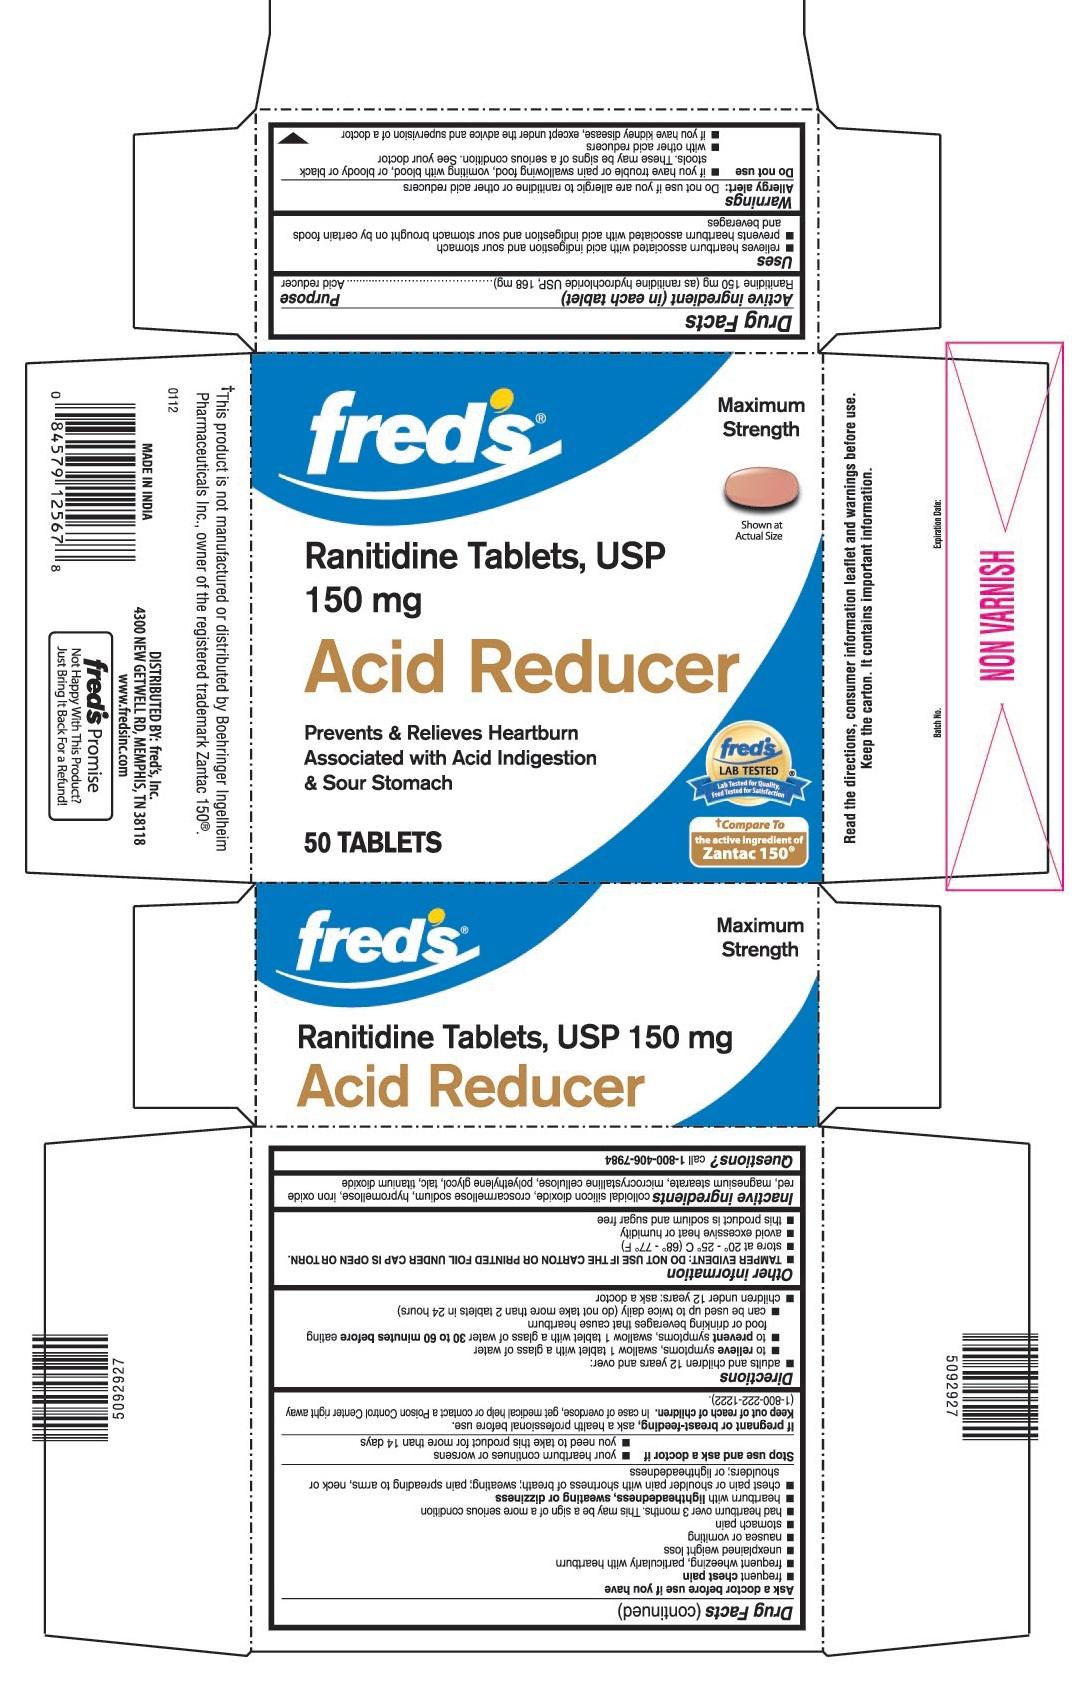 Acid Reducer (Ranitidine) Tablet [Fred's Inc.]